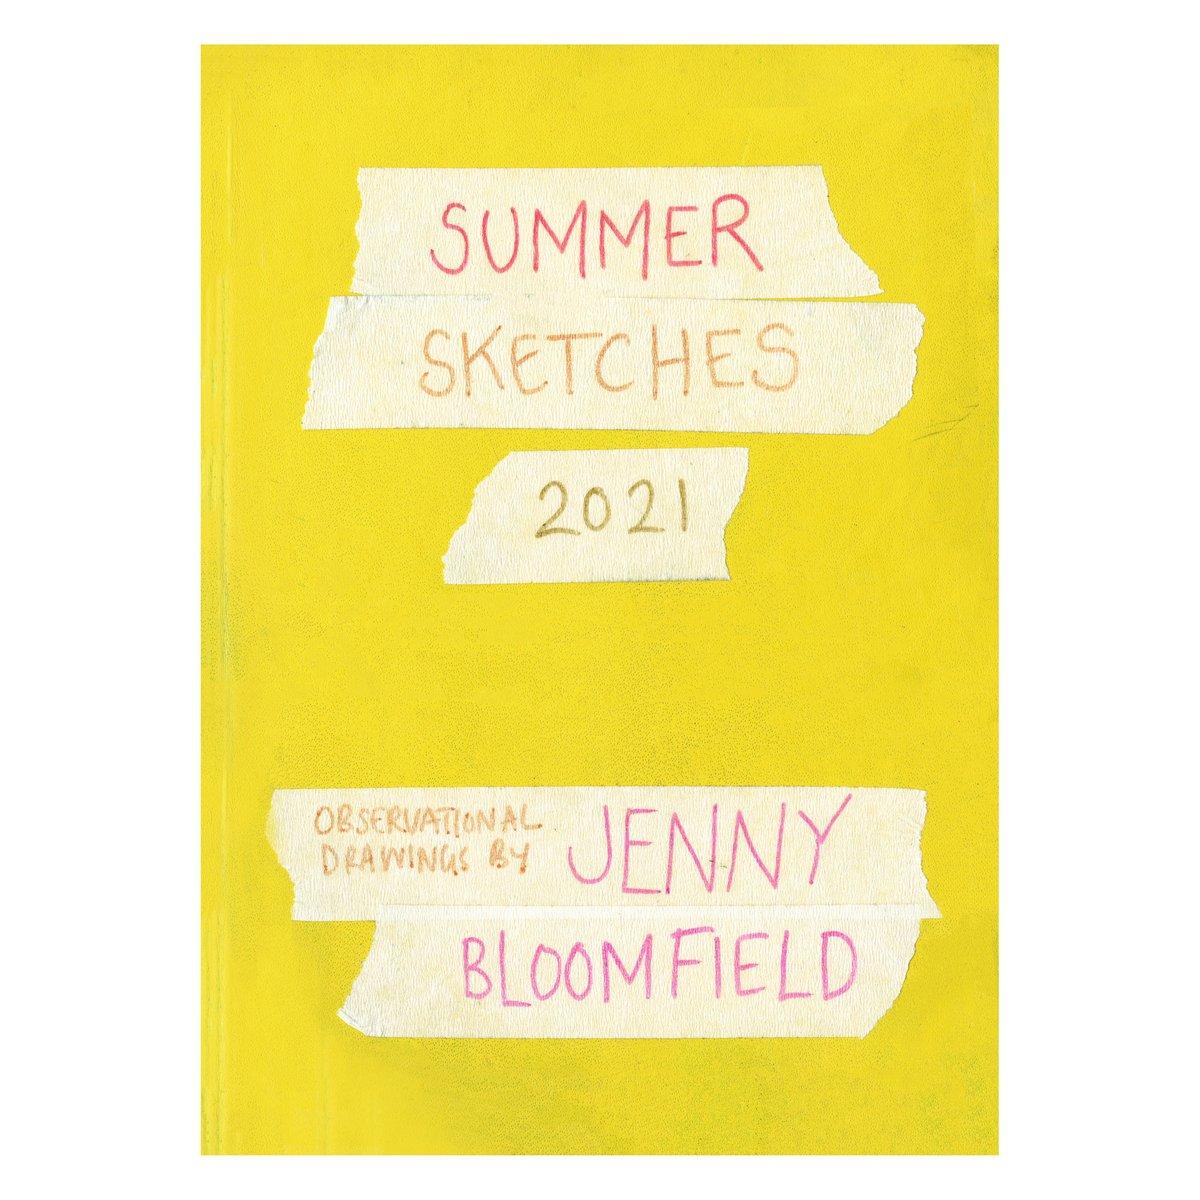 Image of **PREORDER** Summer Sketches - Sketchbook Zine